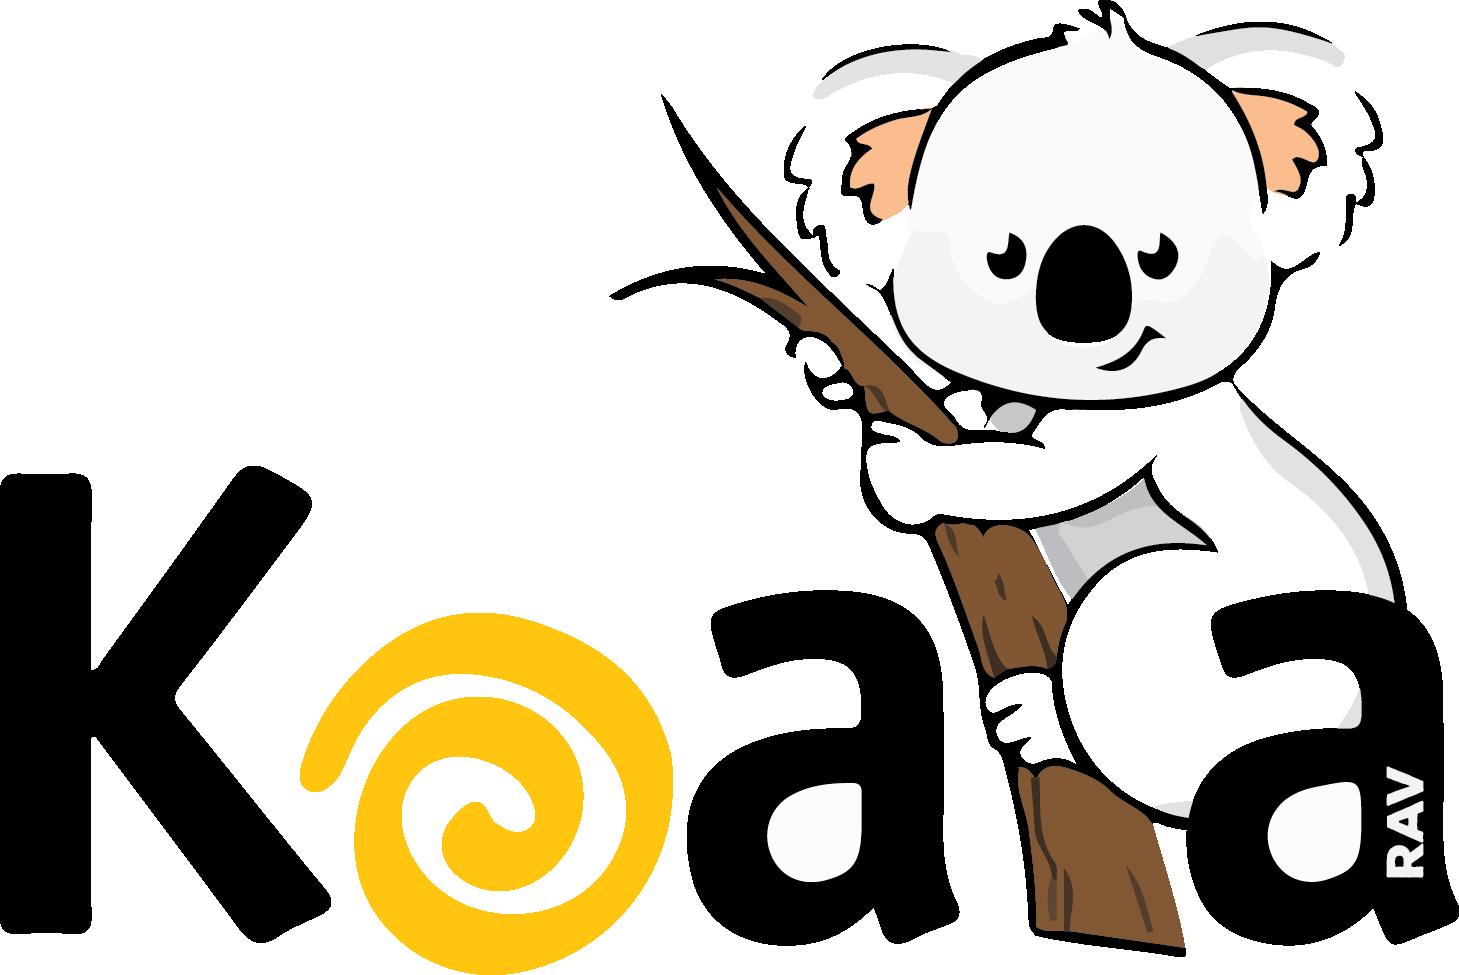 Asociatia Koala- Reabilitarea Auditiv Verbala logo